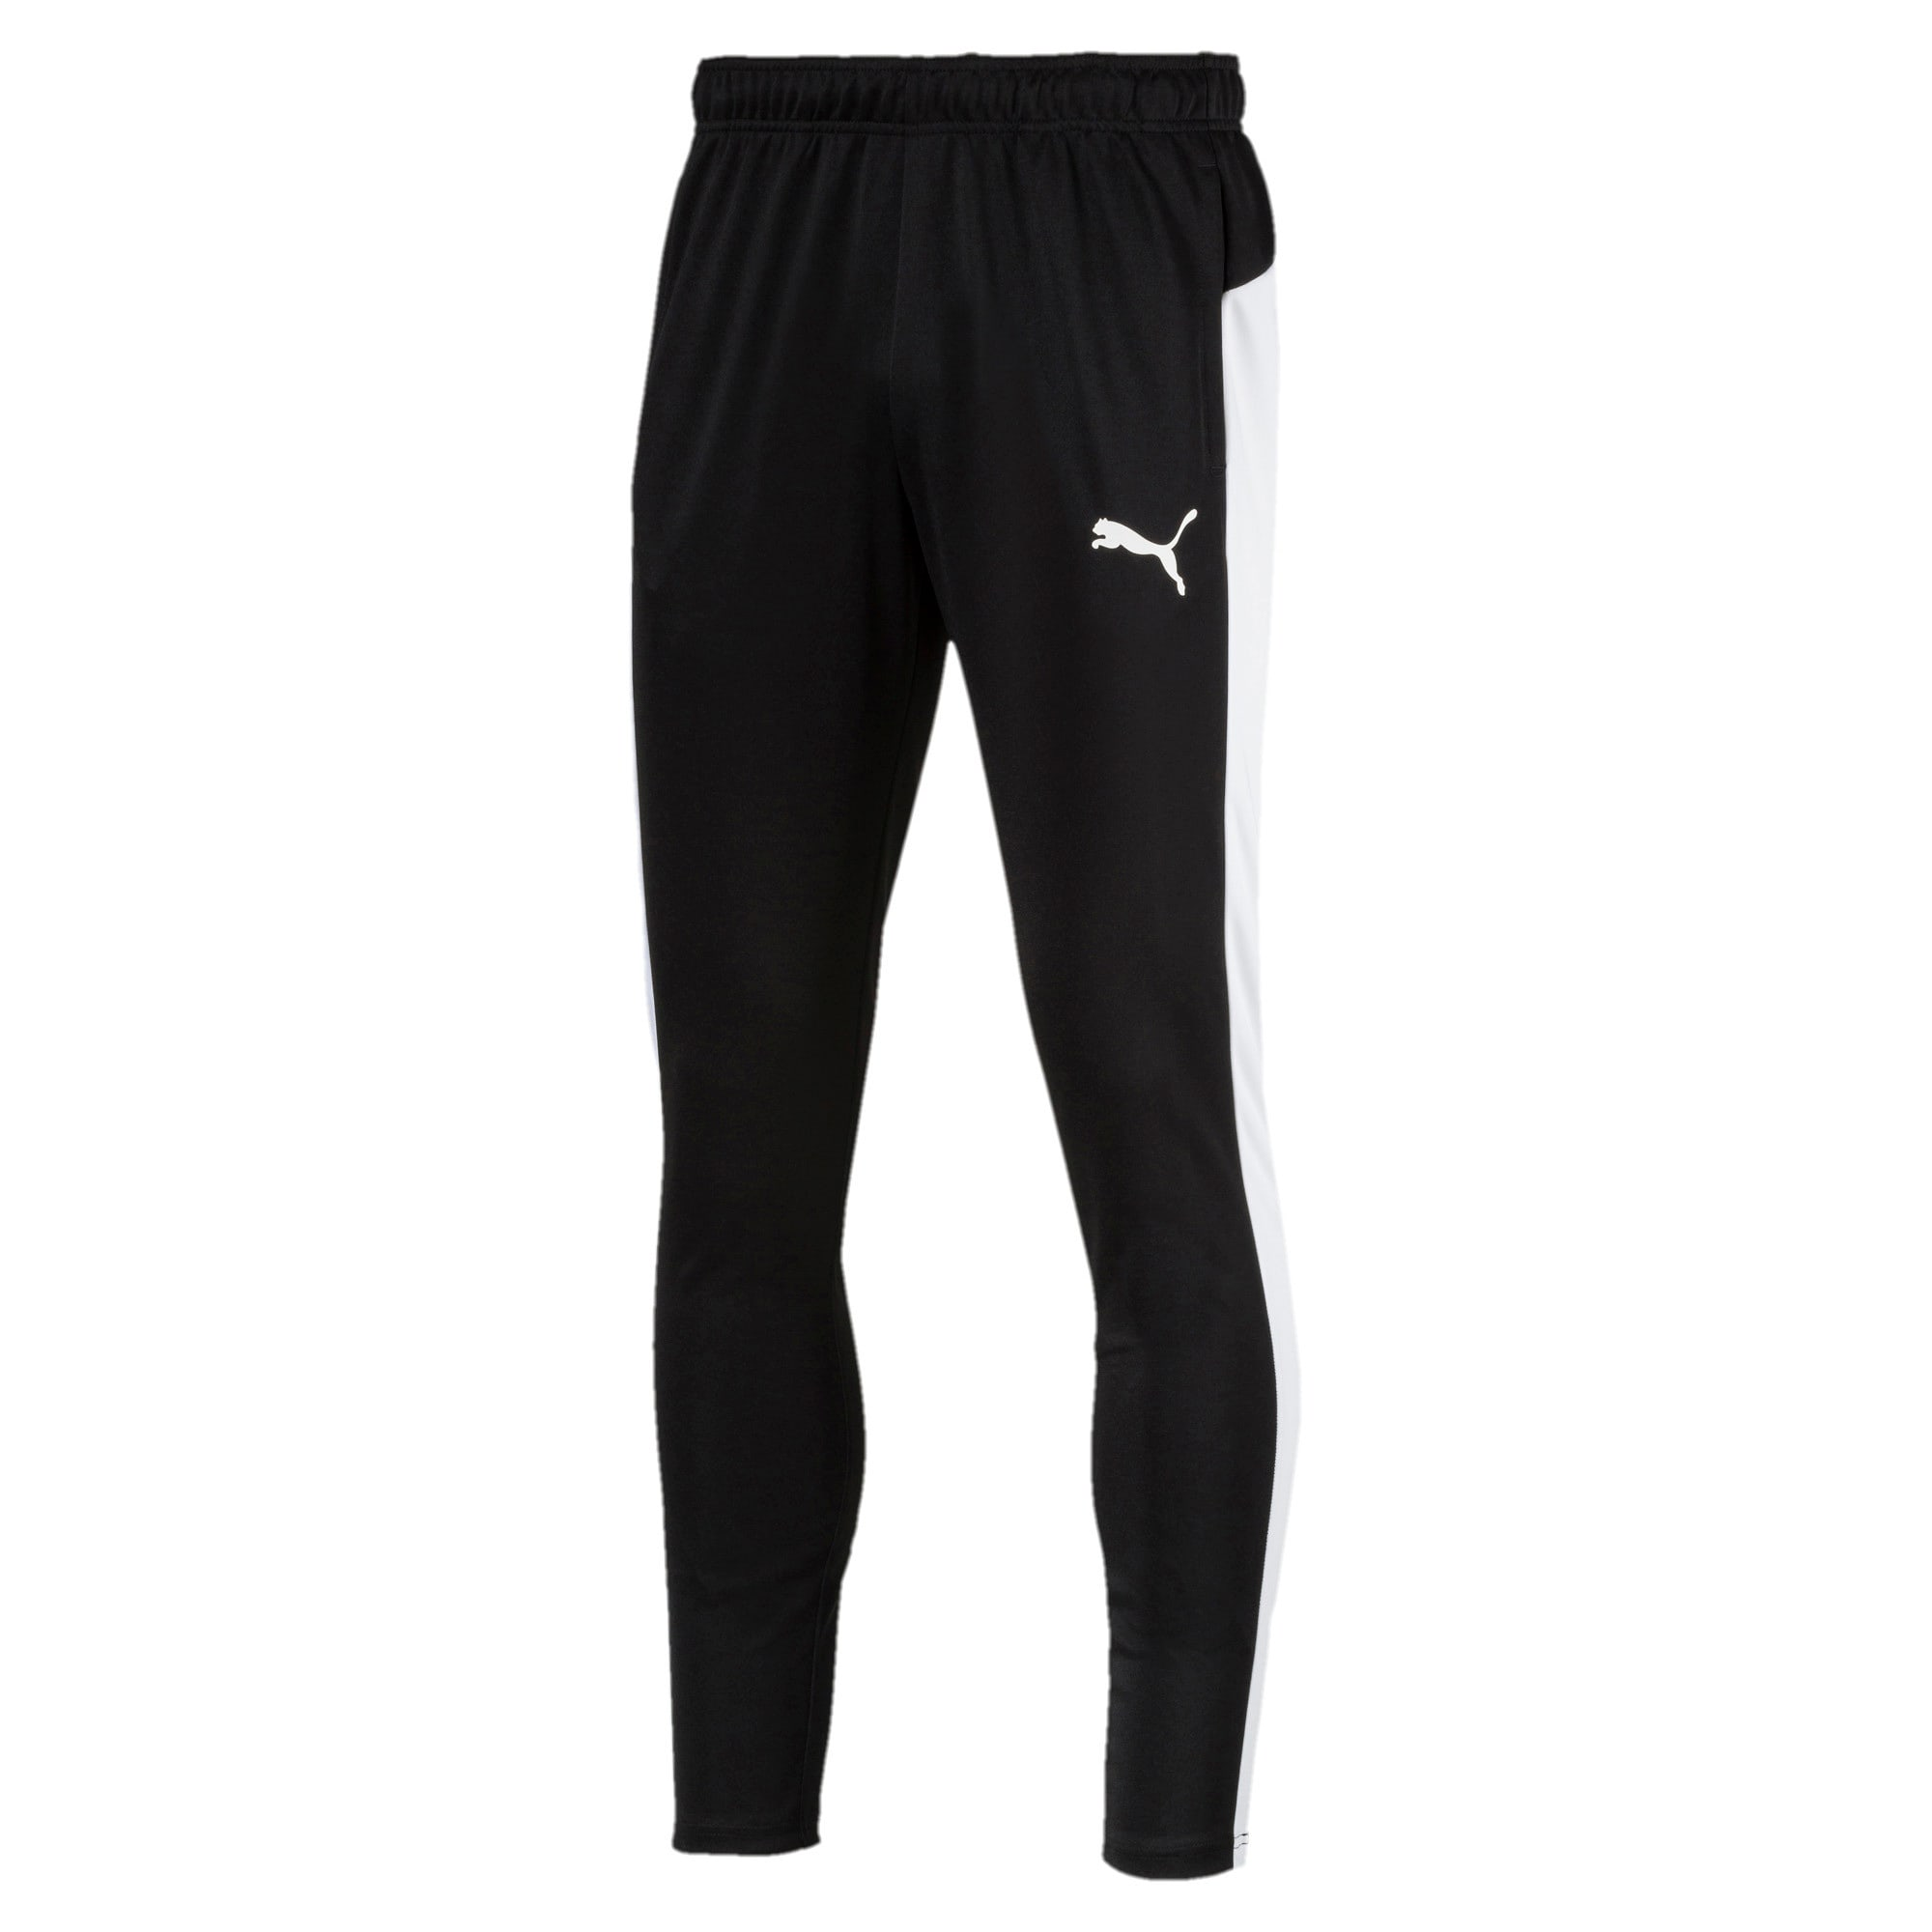 Thumbnail 1 of Active Herren Tricot Sweatpants, Puma Black-Puma White, medium